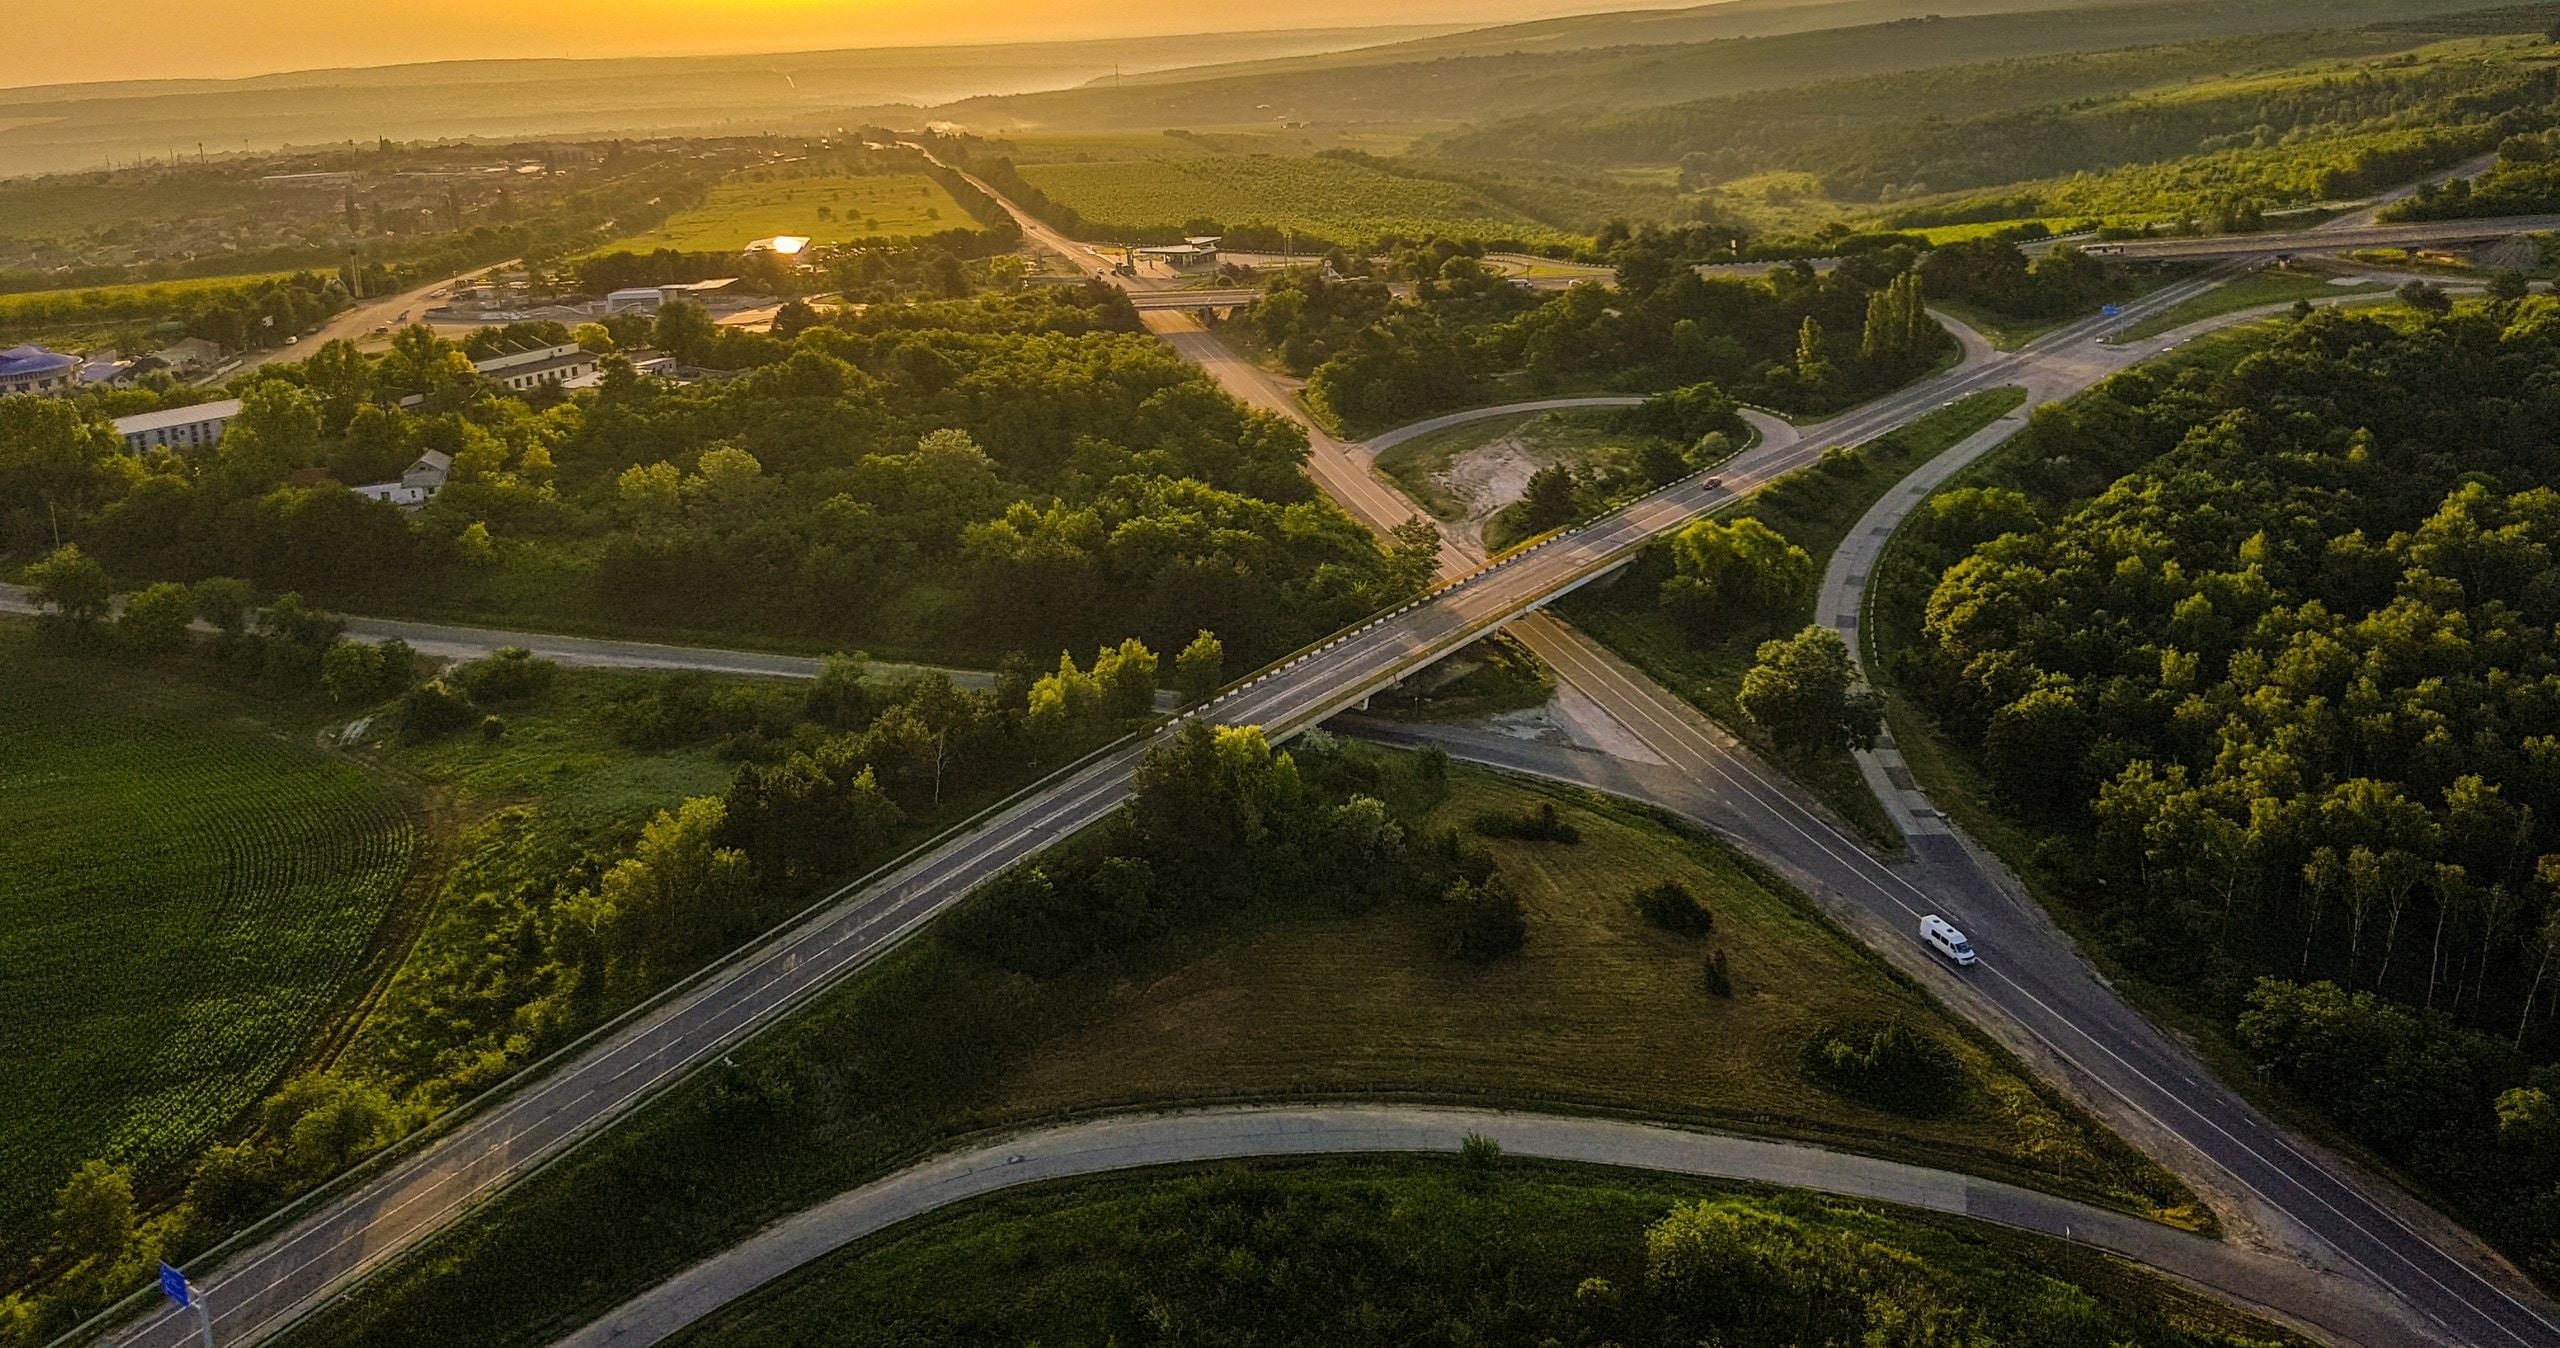 bird's-eye view photography of asphalt road in between trees